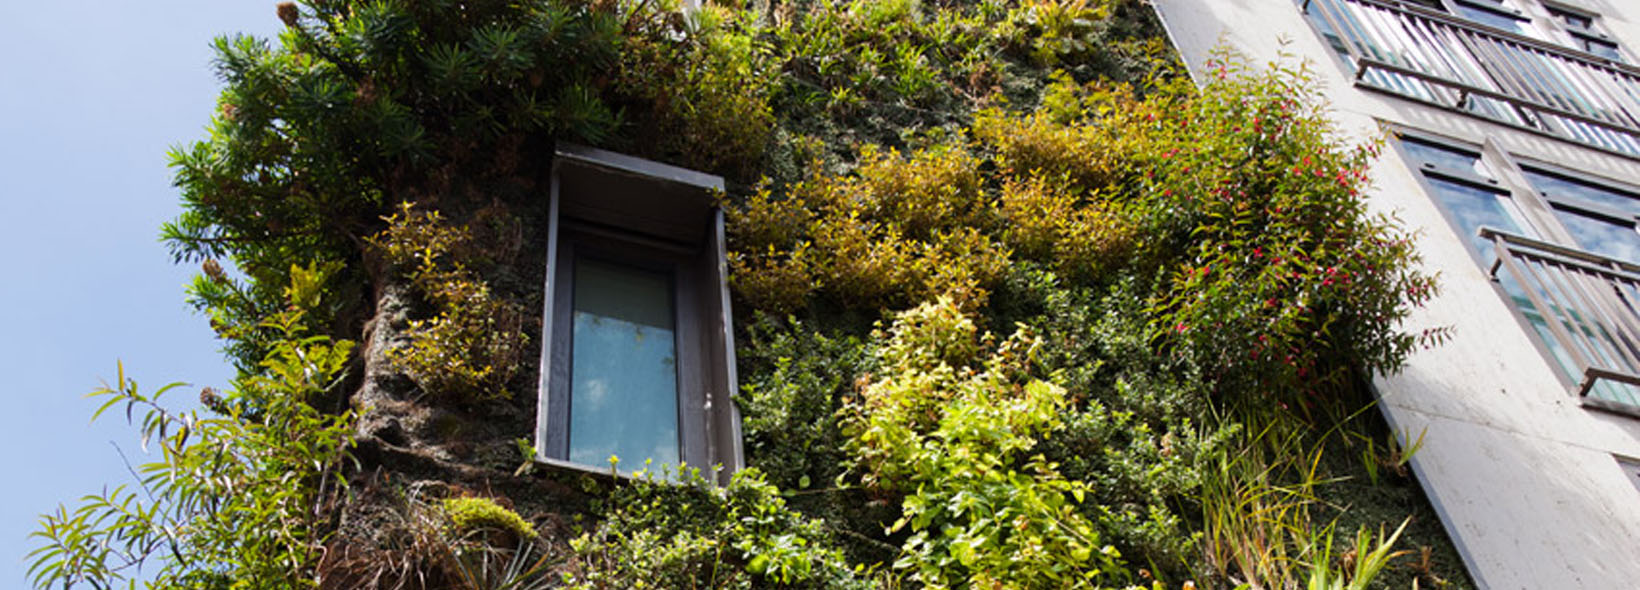 Biophilic Housing Design